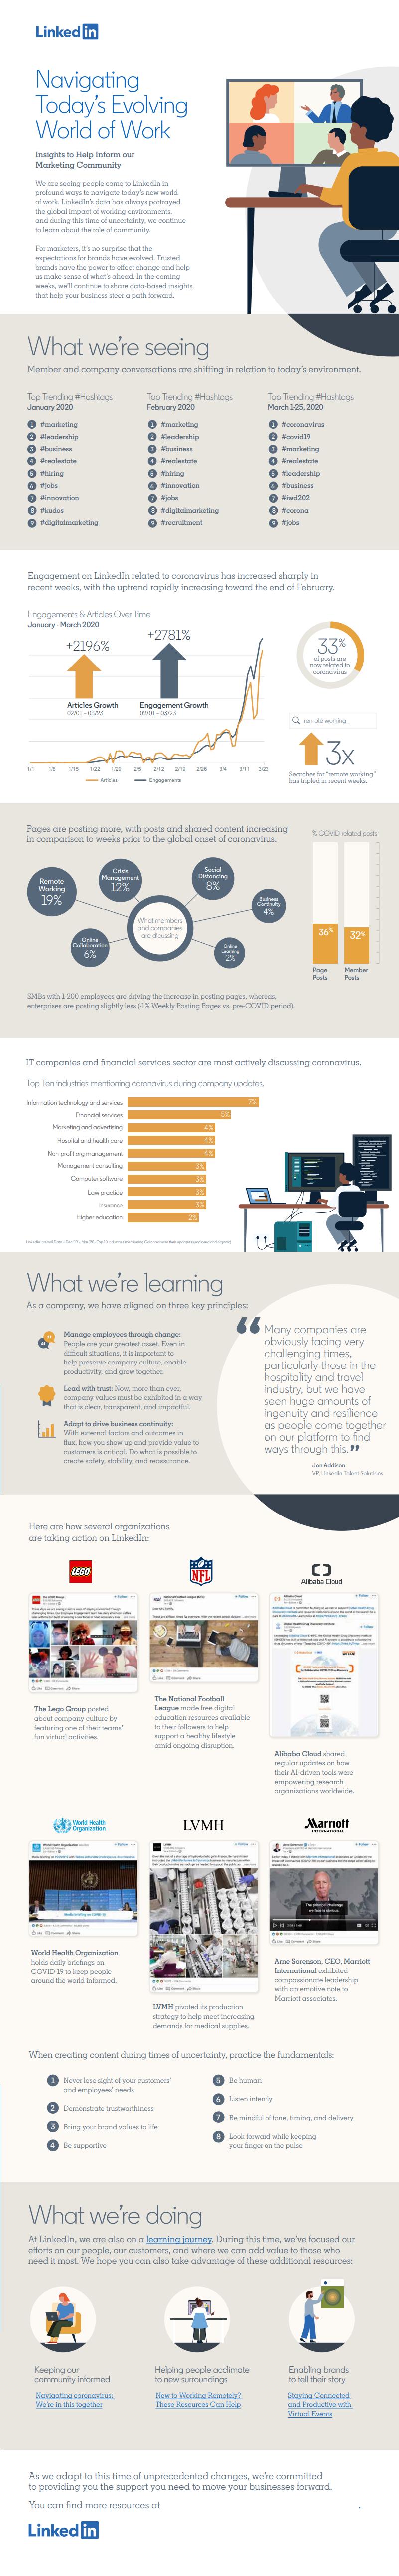 LinkedIn COVID-19 infographic